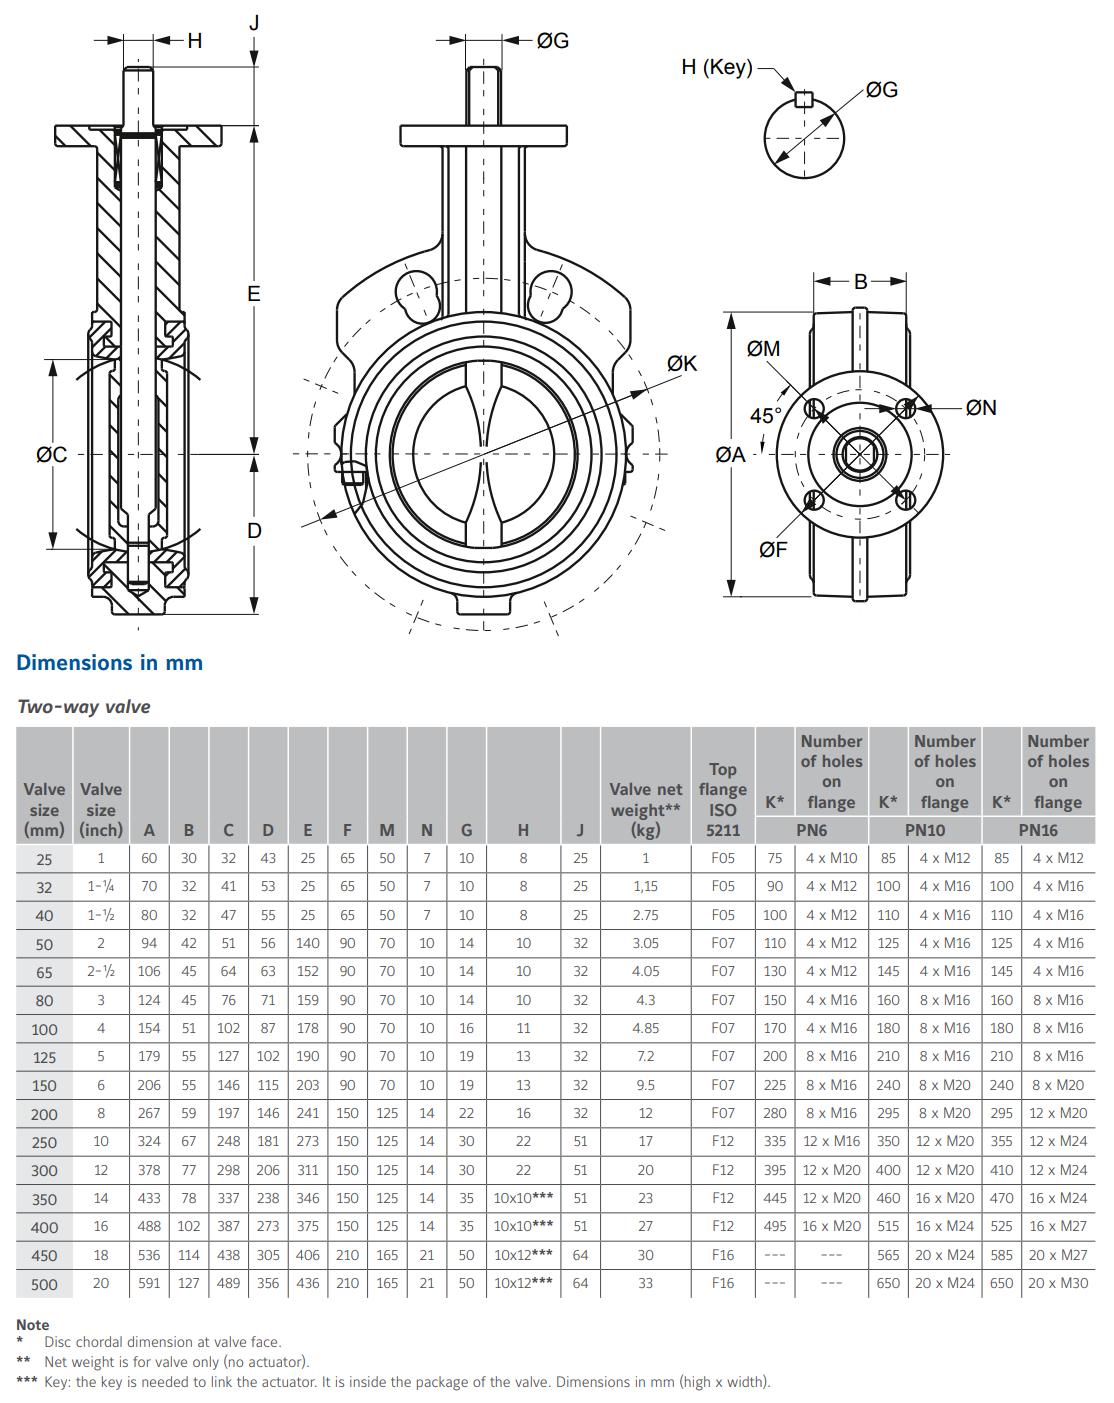 Johnson Controls VFB - Dimensions